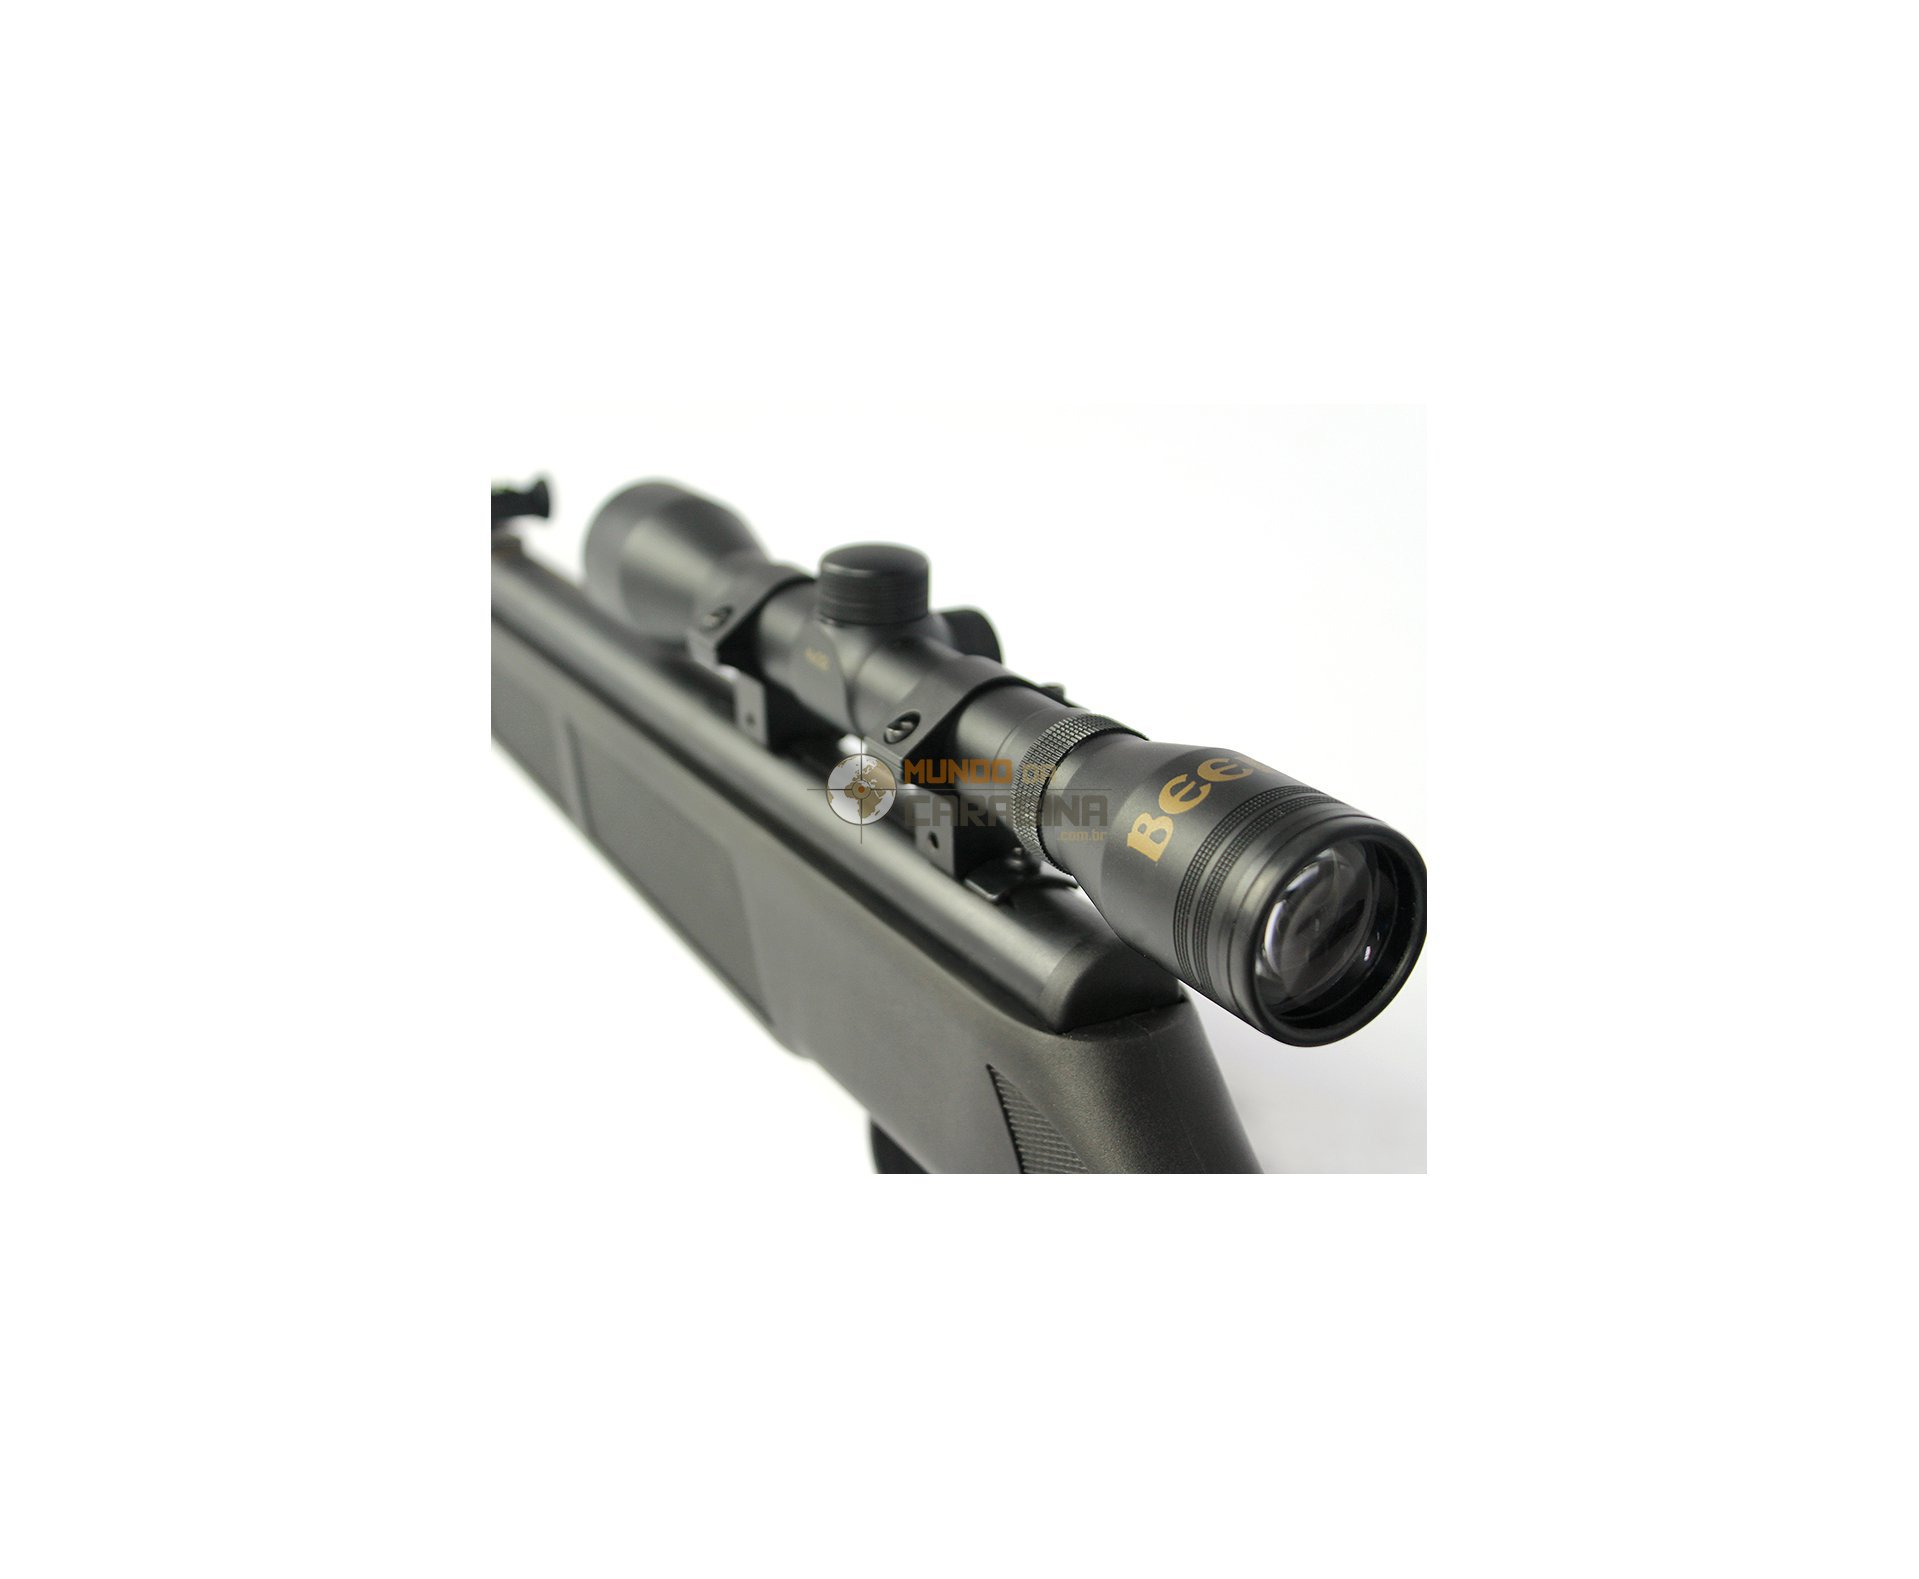 "Carabina De Pressão Beeman 1074 - Calibre 4,5 E 5,5 Mm + Luneta E Capa 52"" - Rossi"